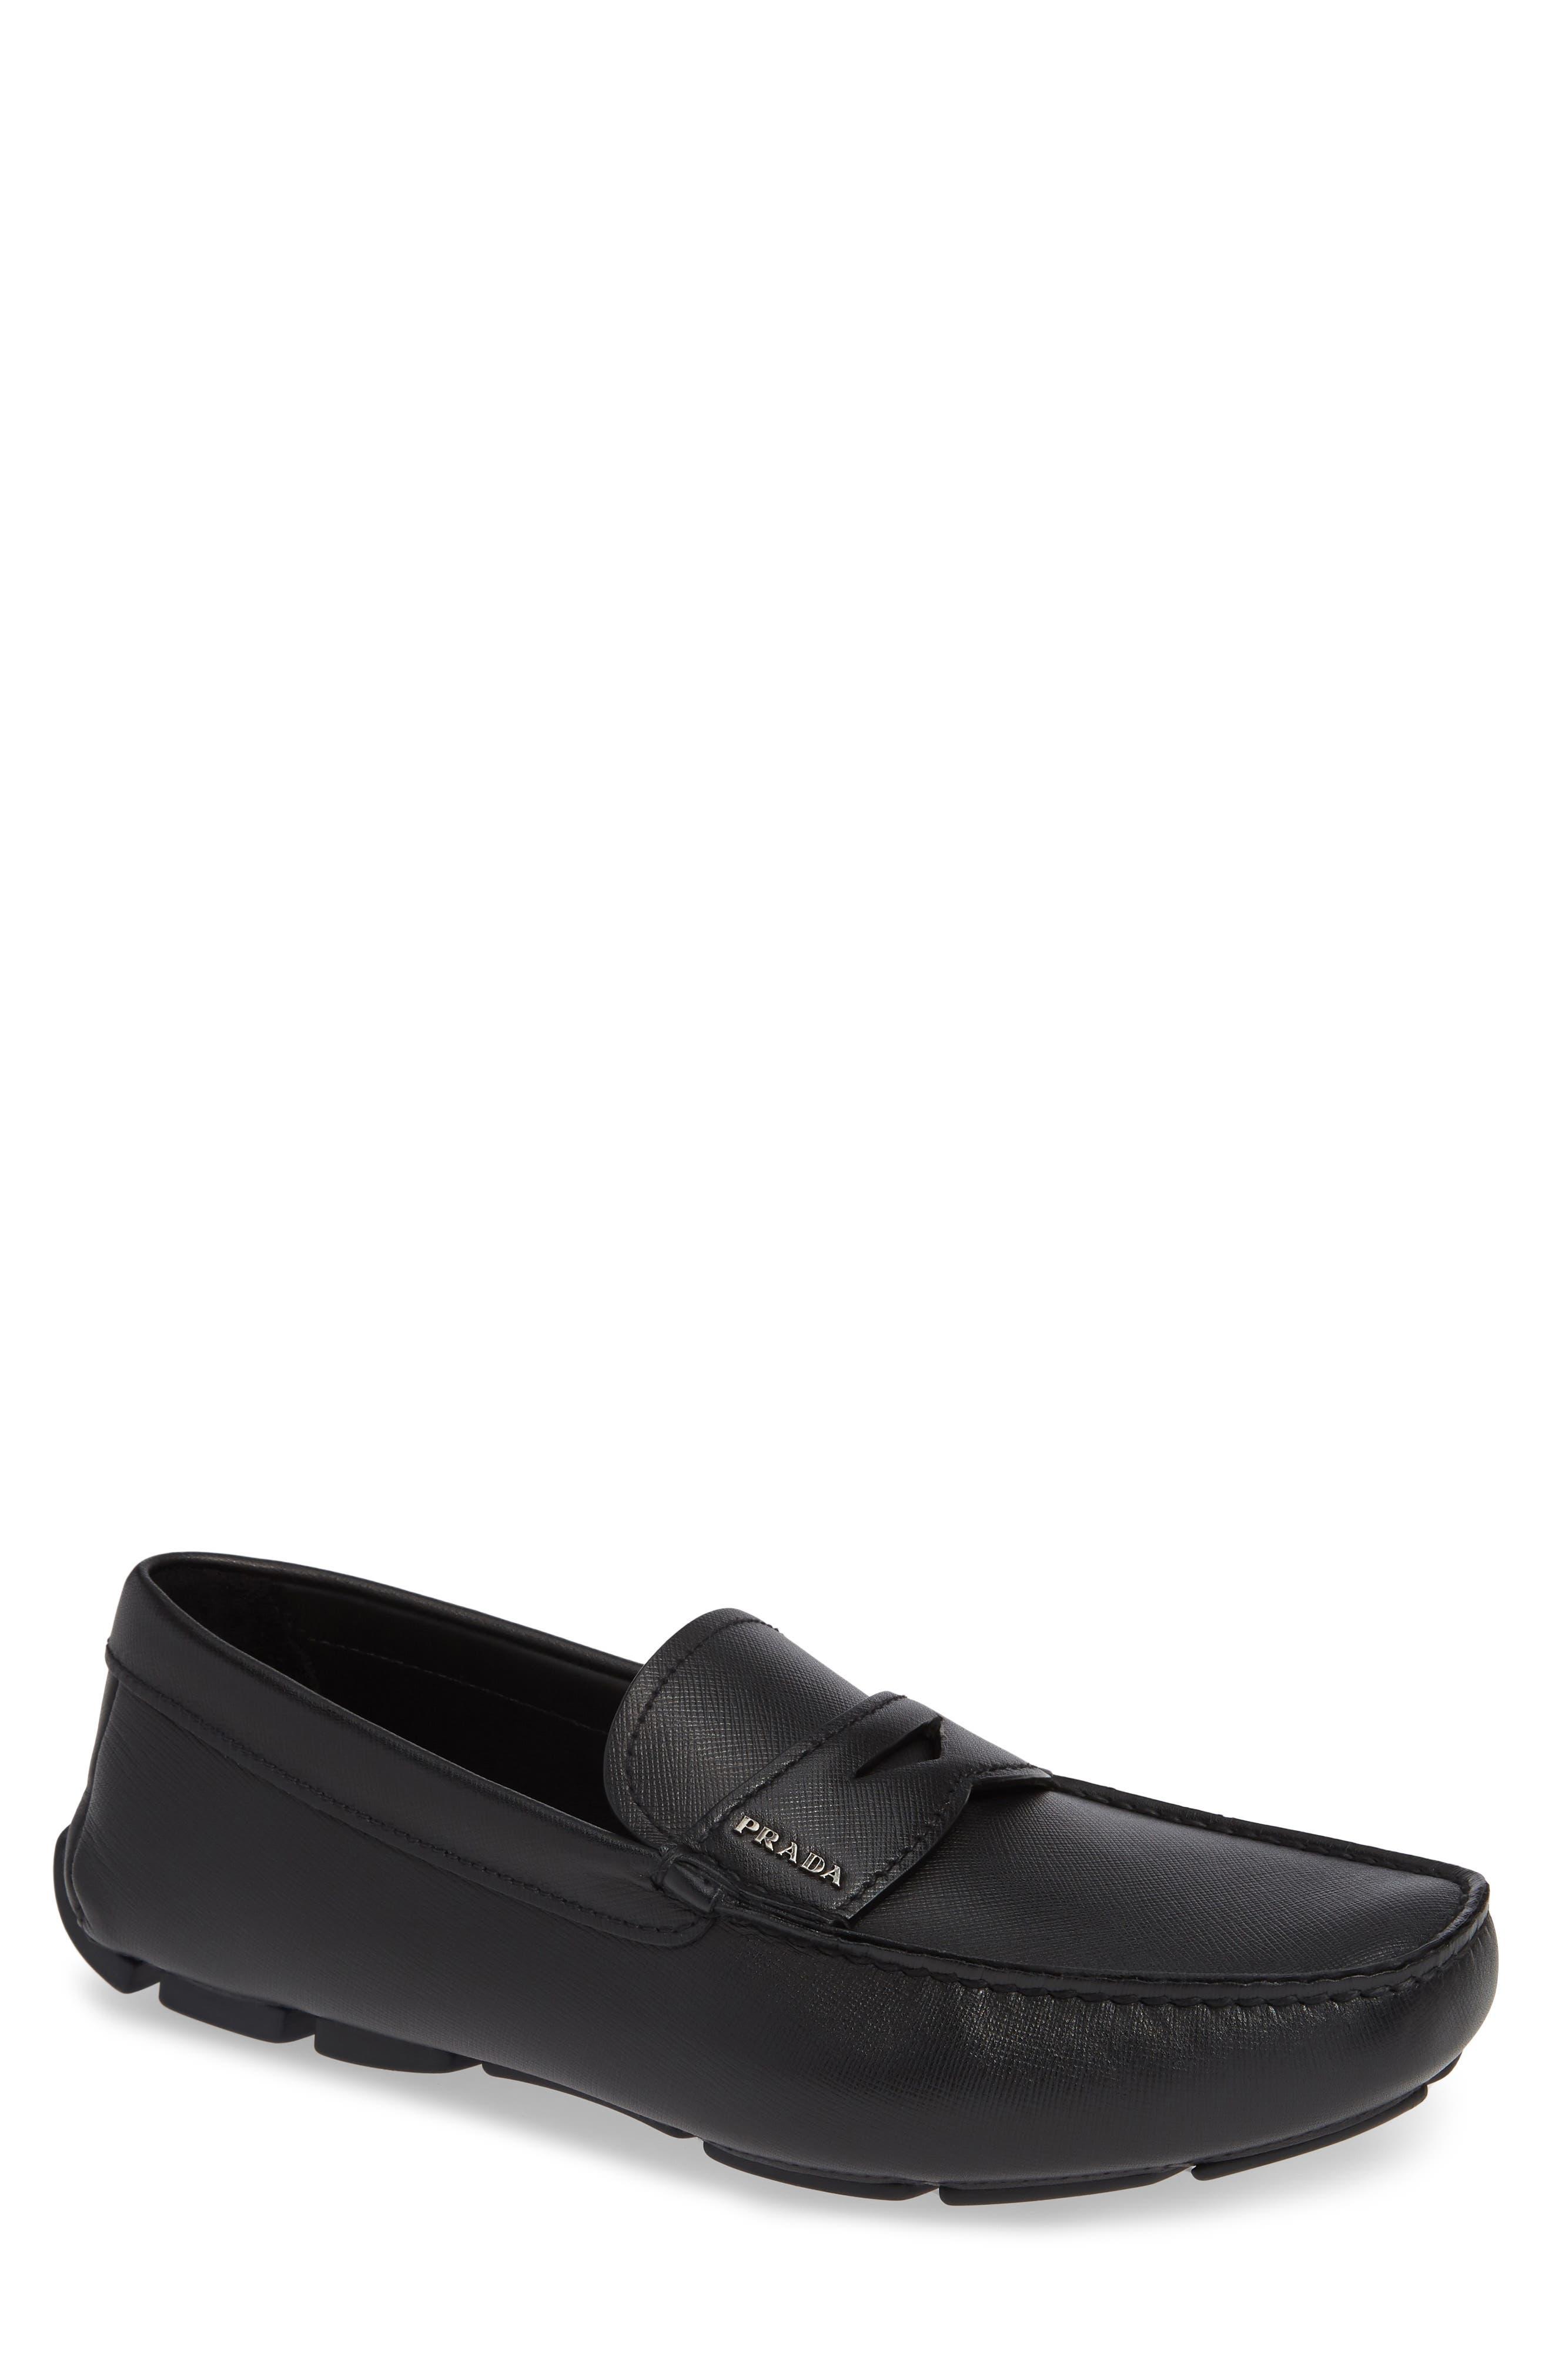 981c4bbb4c1 Men s Prada Loafers   Slip-Ons